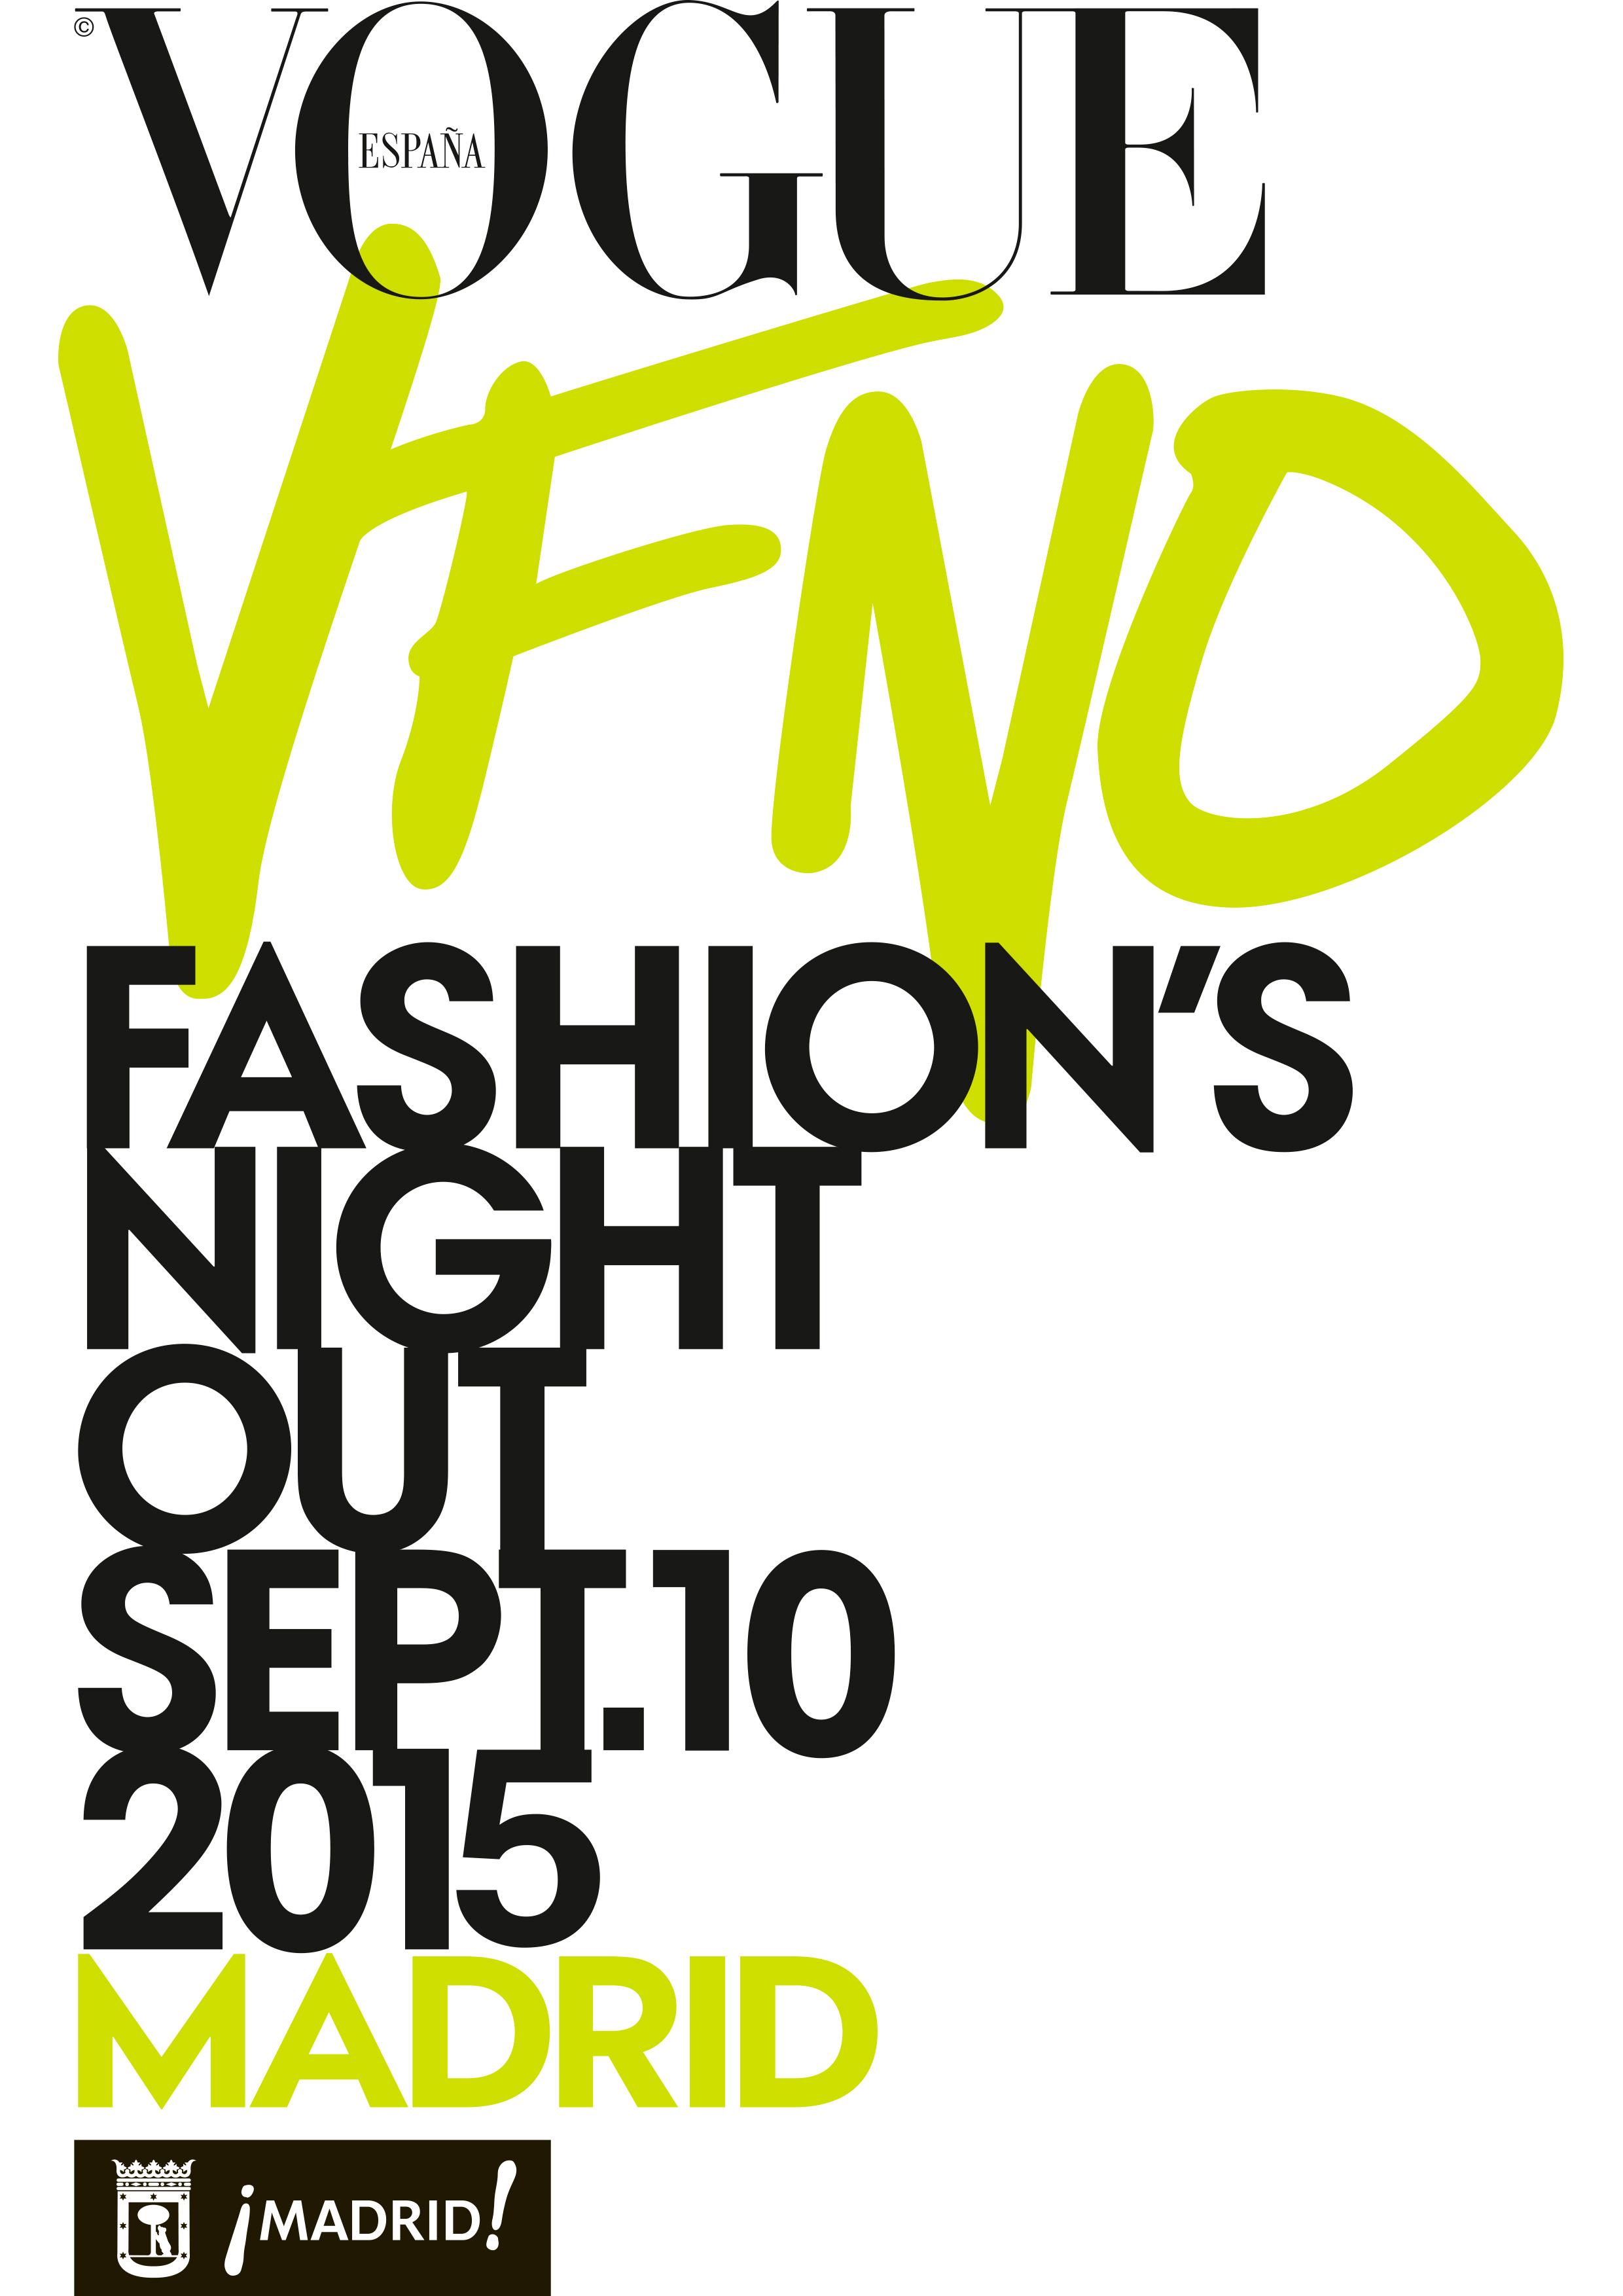 760beb69ef Oh my Cut! en la Vogue Fashion´s Night Out 2015 de Madrid - Oh my ...